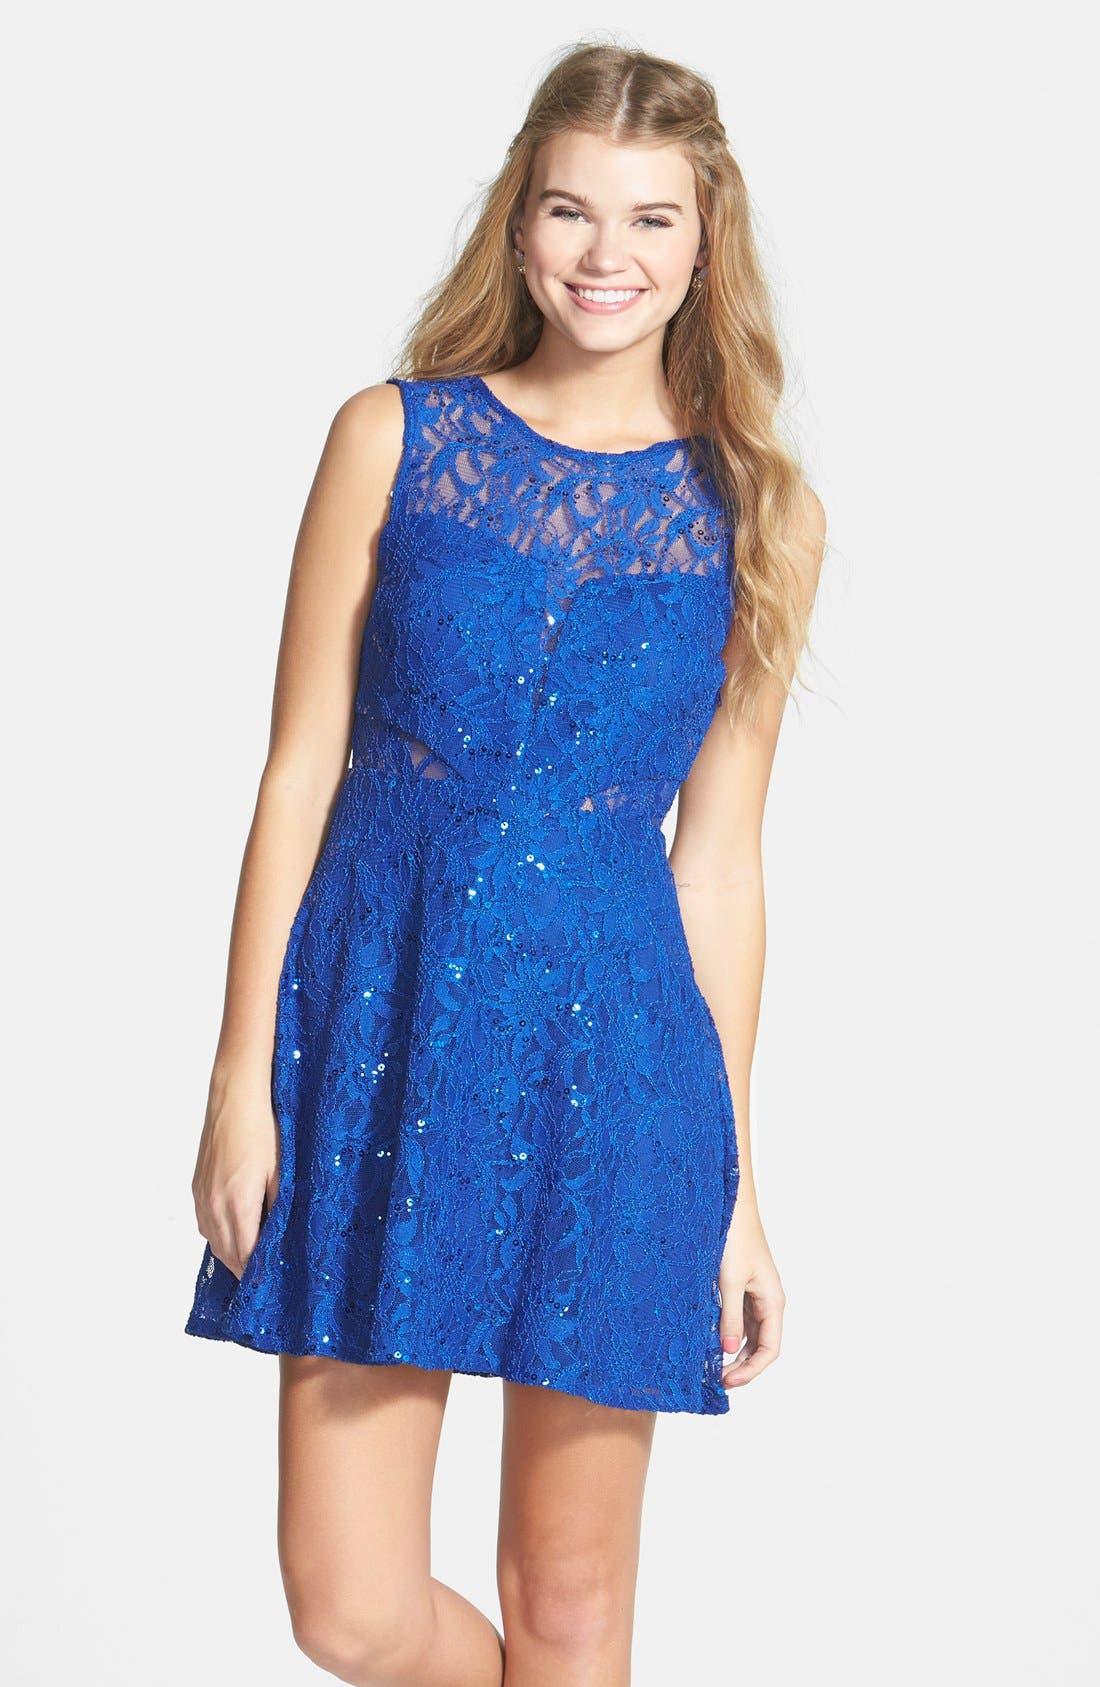 Alternate Image 1 Selected - Hailey Logan Sequin Lace Illusion Skater Dress (Juniors)